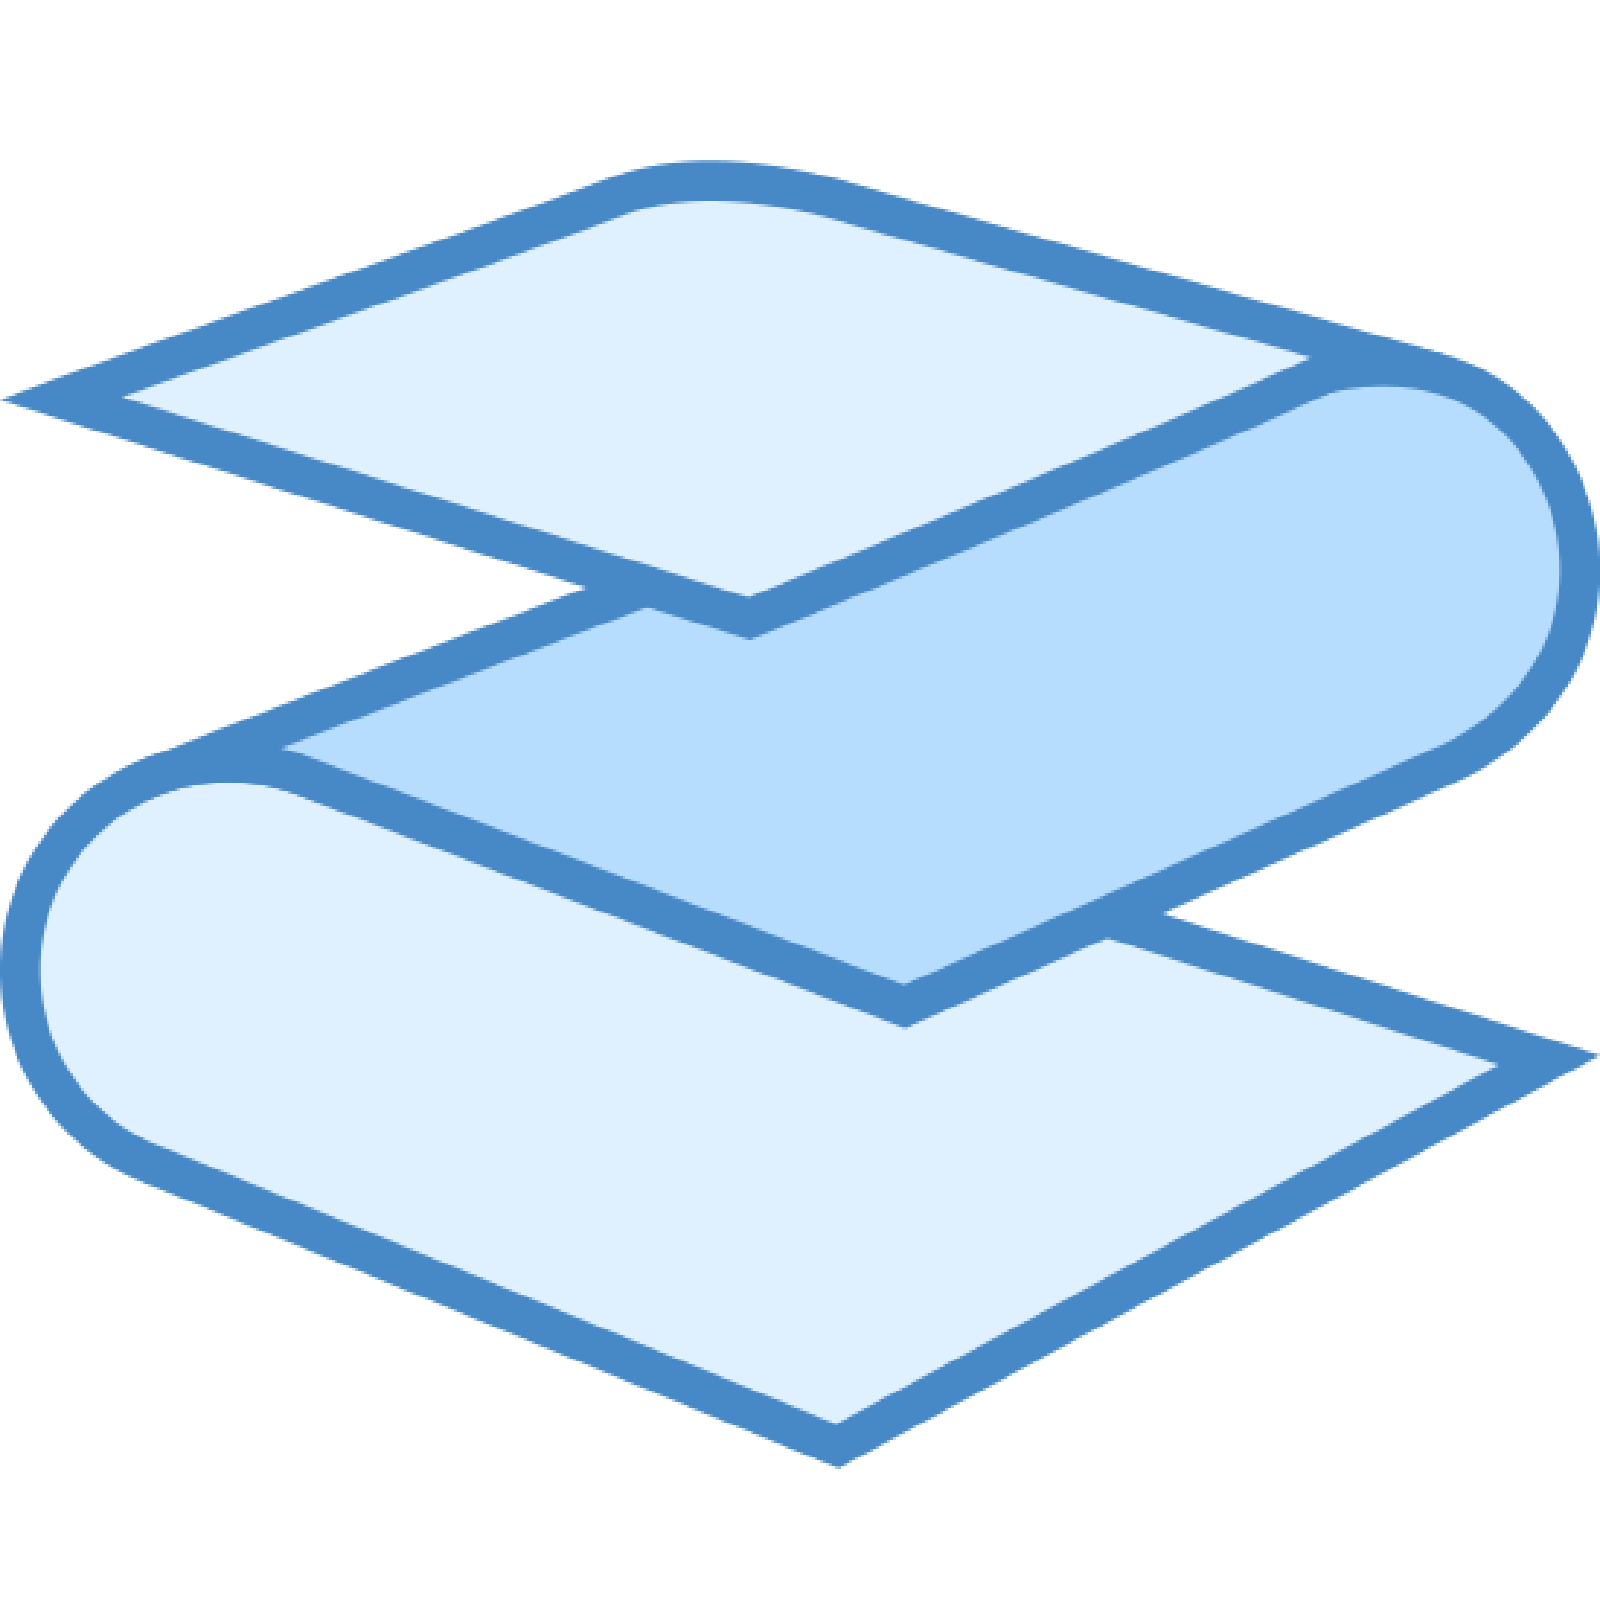 Folia NRC icon